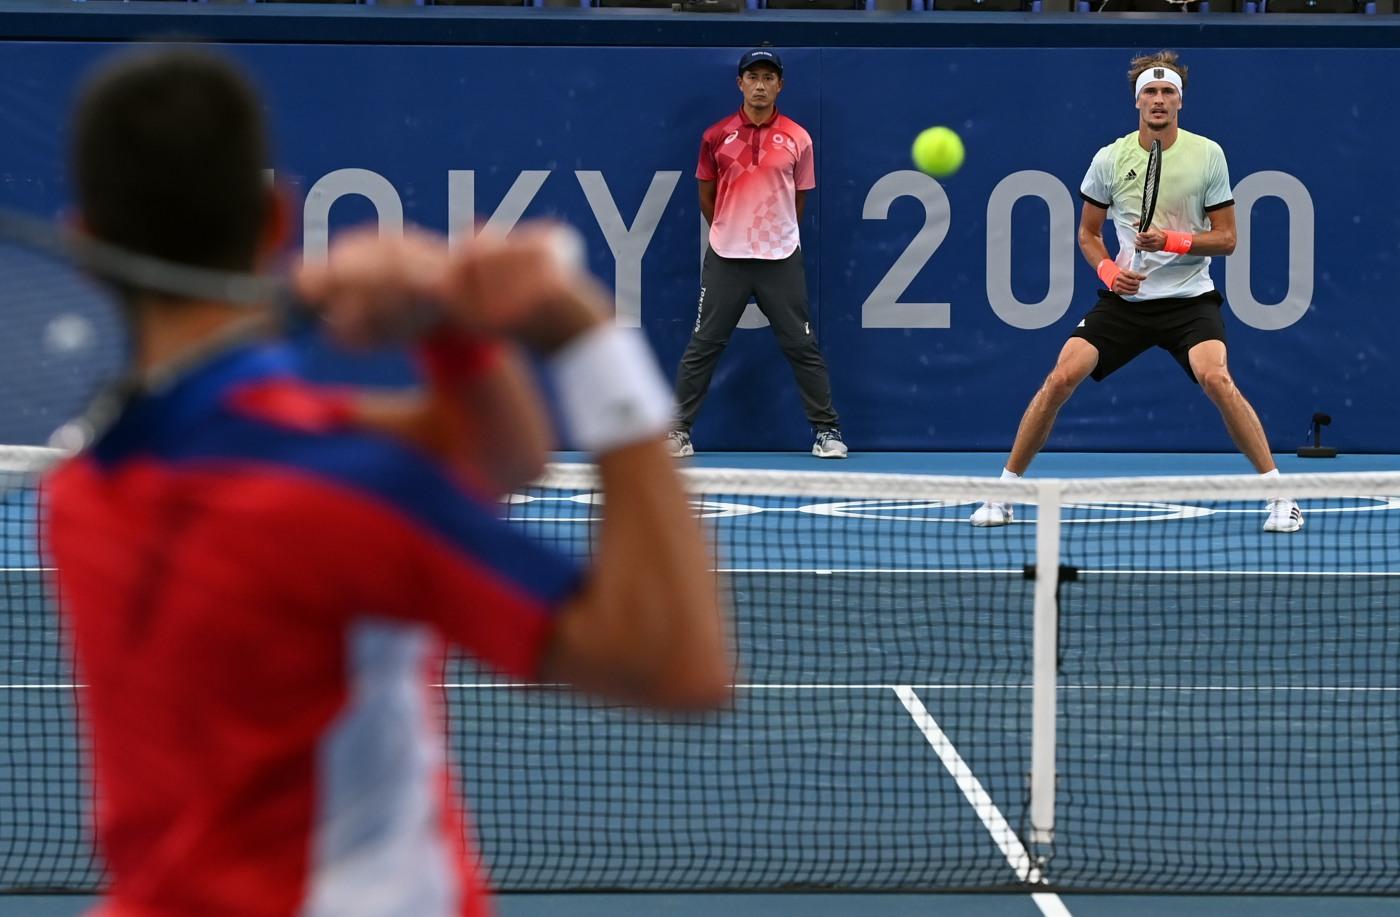 Tokyo 2020 - Tennis